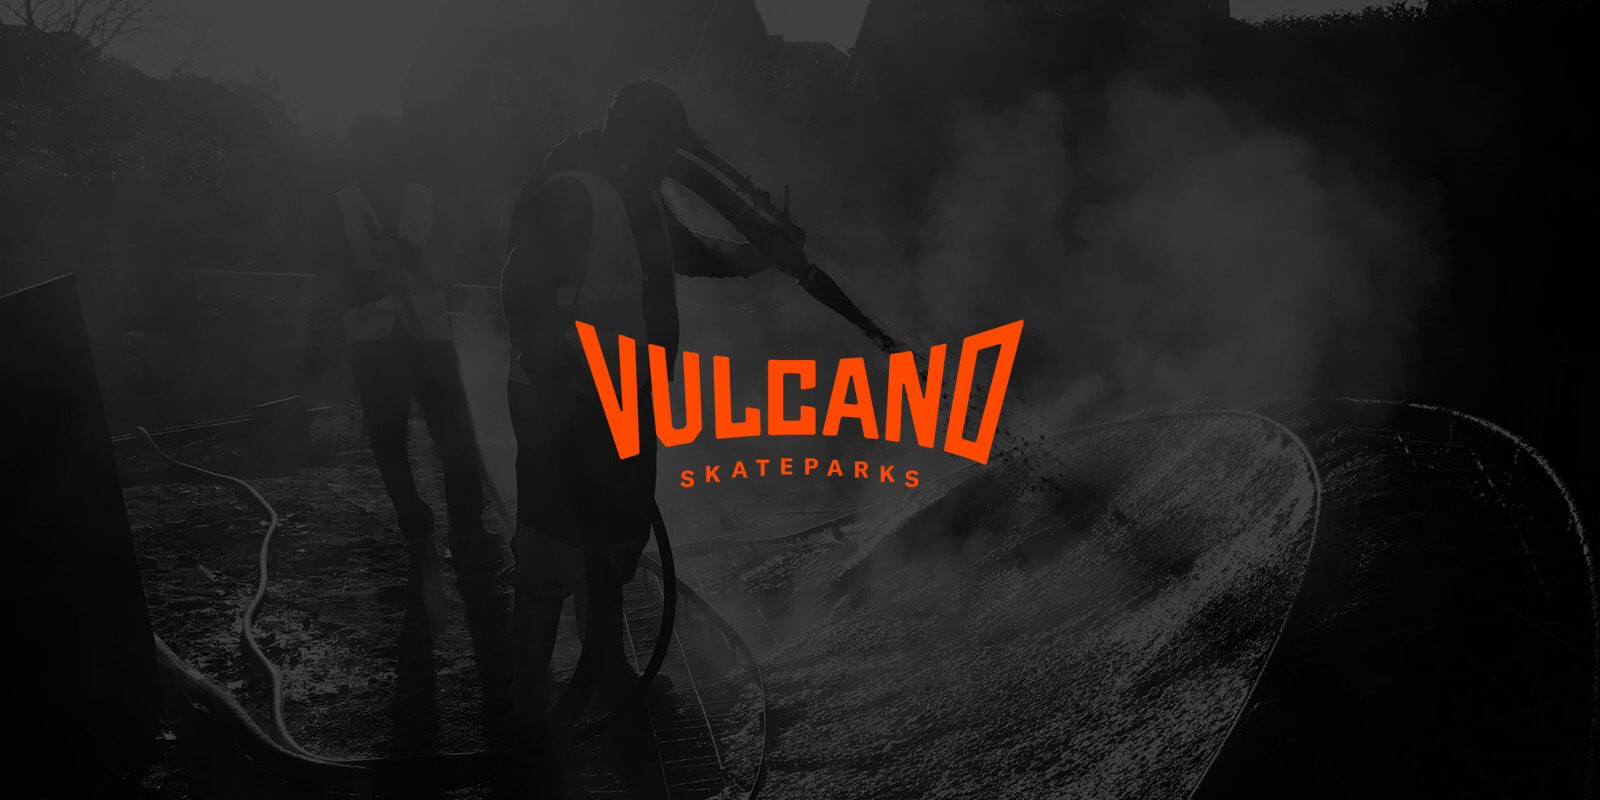 Vulcano Skateparks